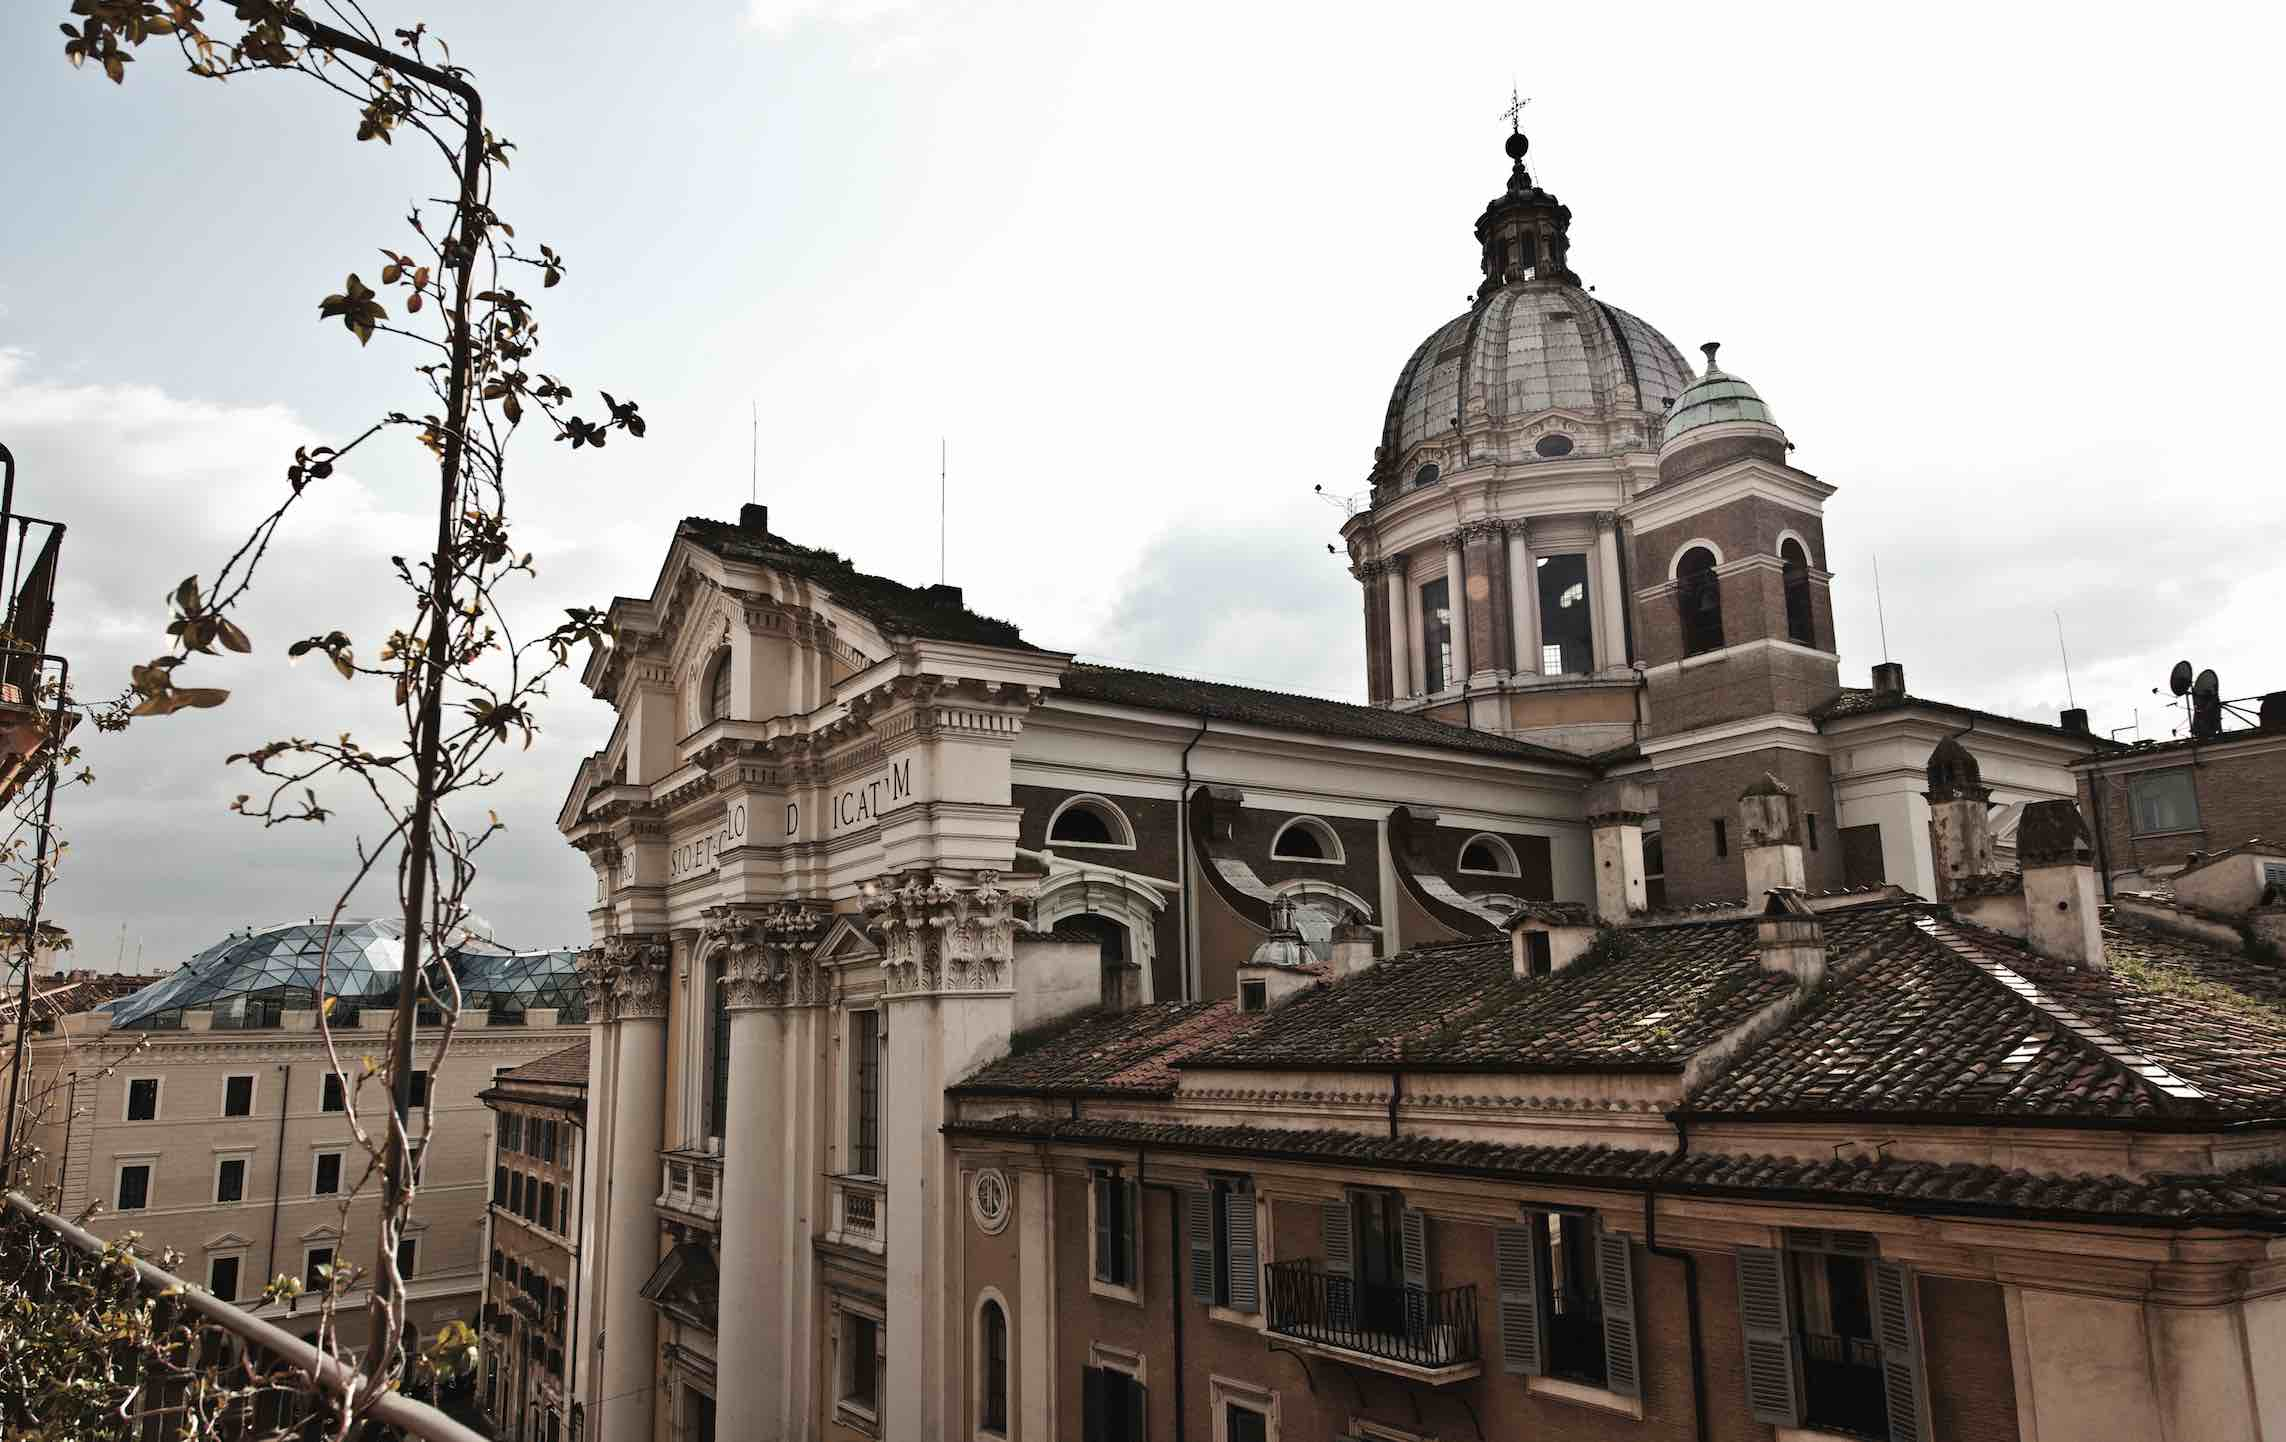 La Scelta di Goethe - Best Hotels Rome View5.jpg